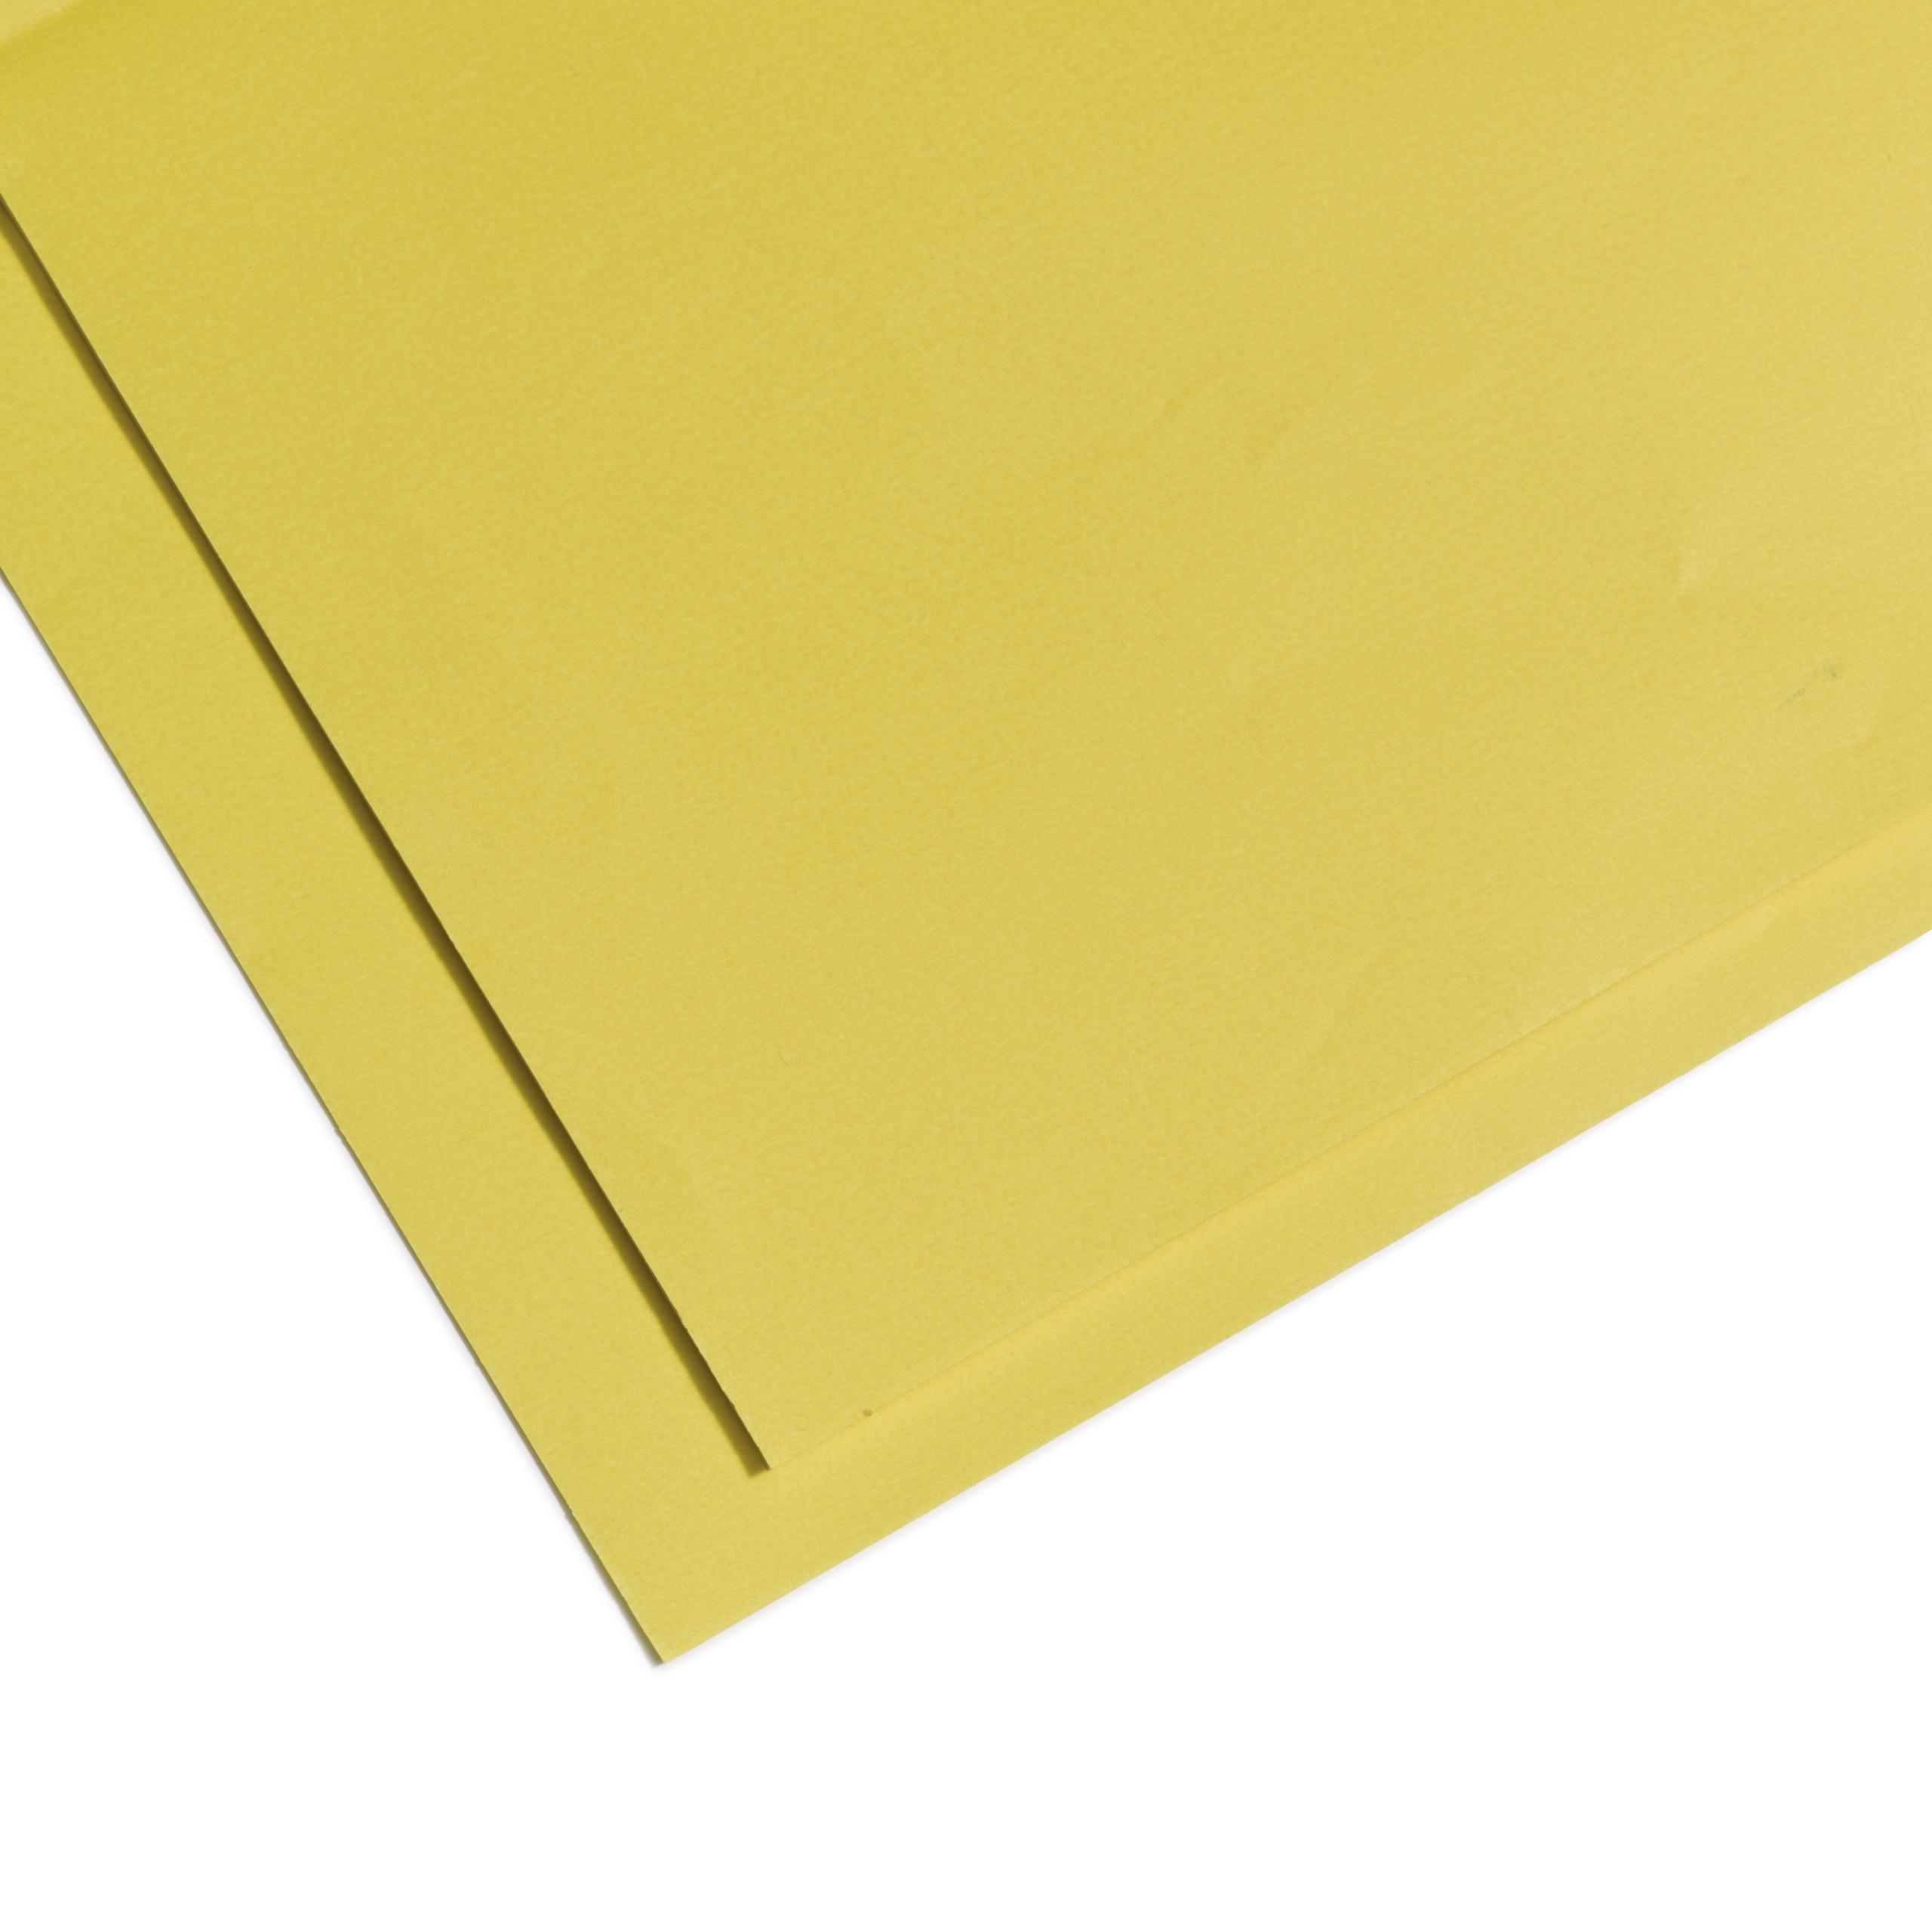 kopírovací papír žlutý 2ks 82x57cm-2